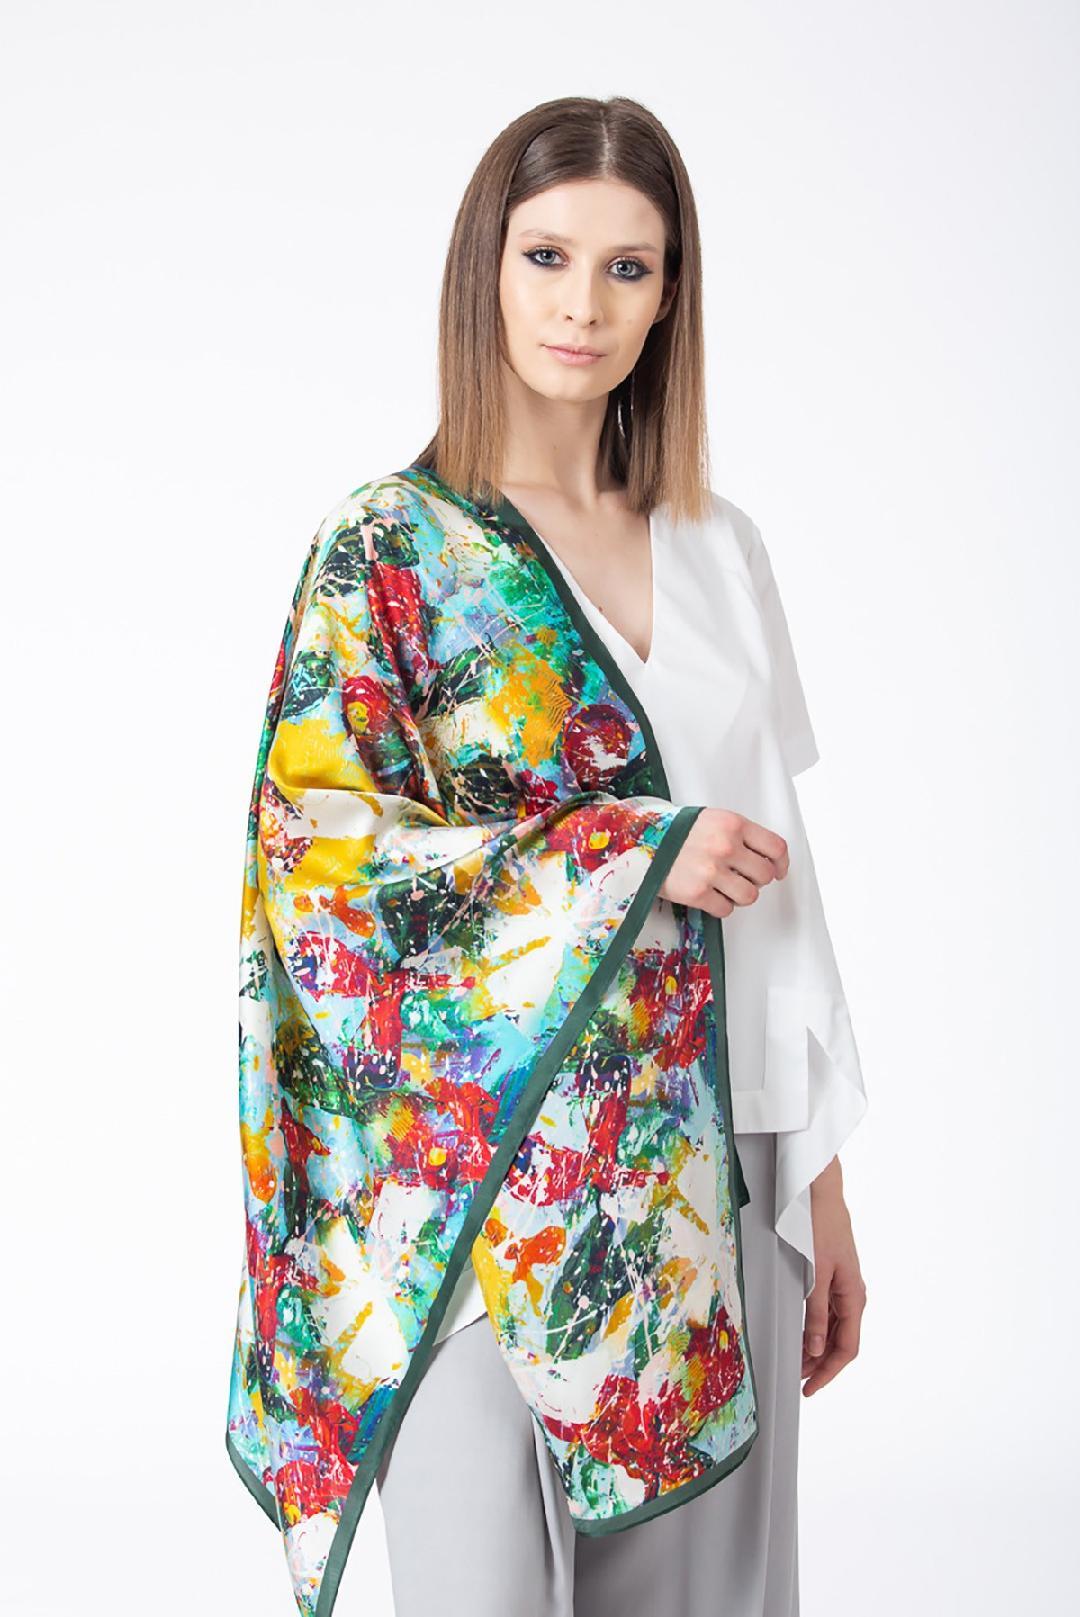 Andrea Tincu primavara-vara 2021: o colectie cu formula complexa, dar usor de purtat si de integrat intr-o garderoba cu spirit atemporal